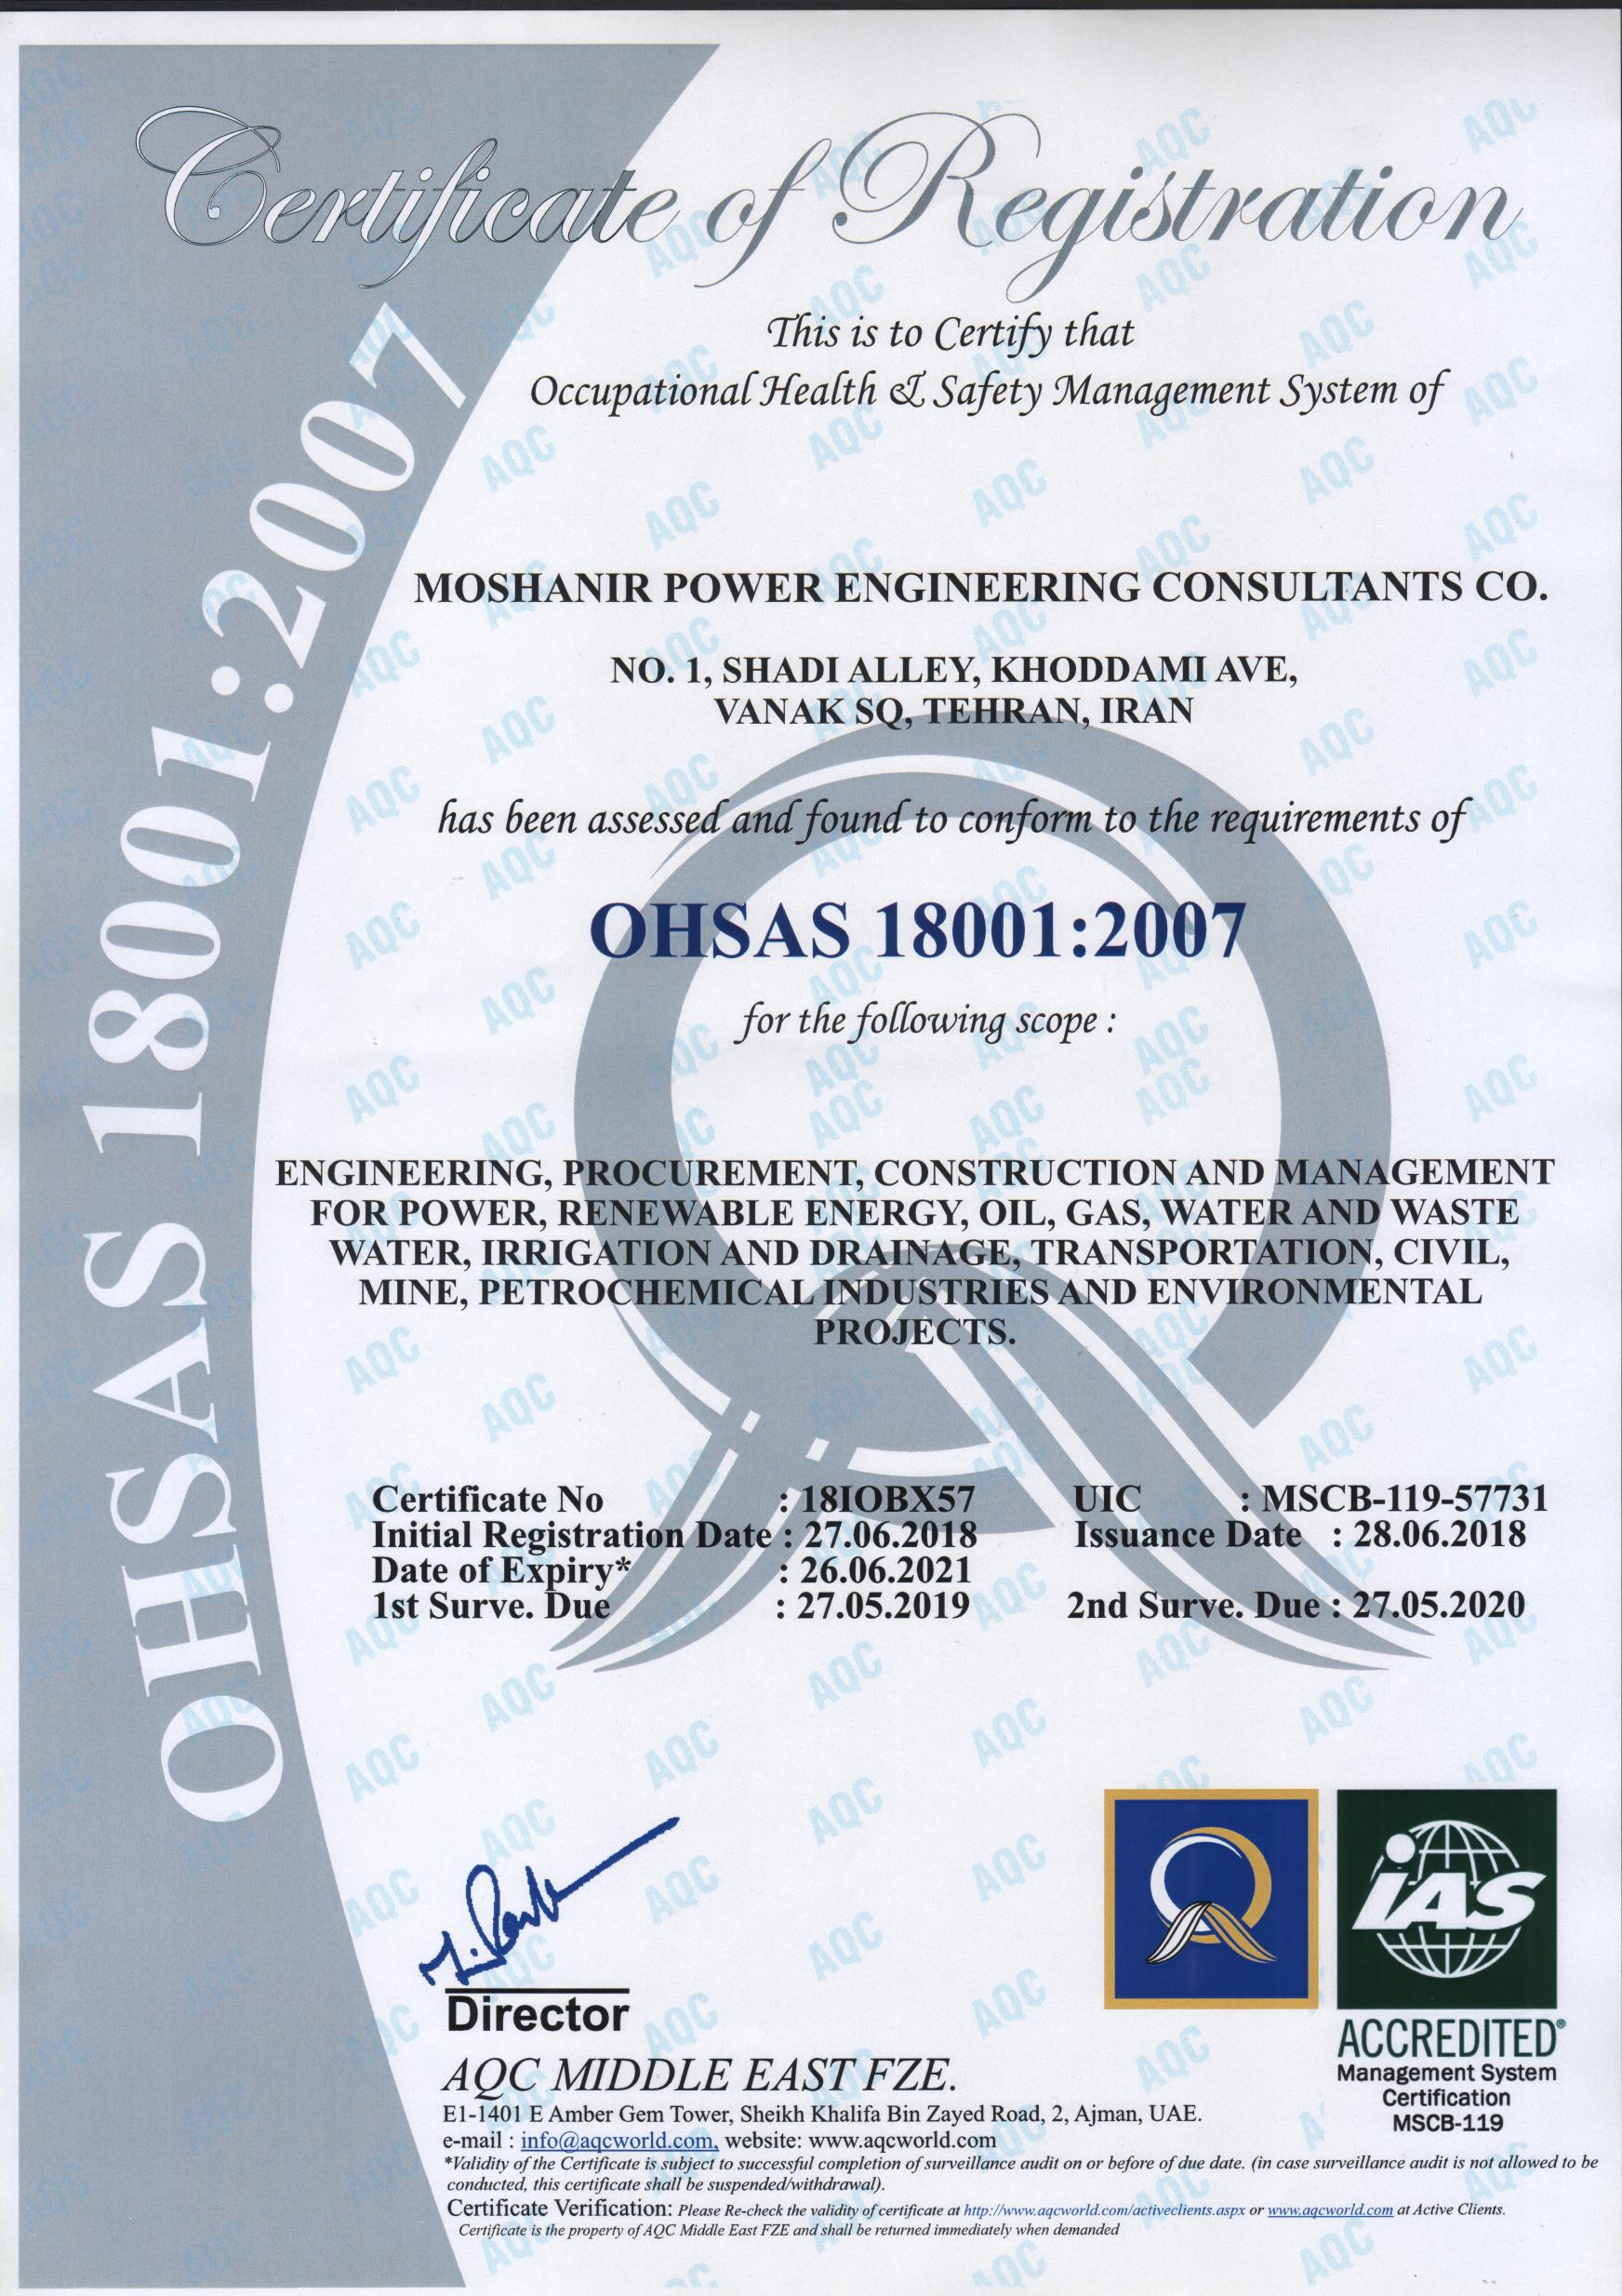 OHSAS۱۸۰۰۱:۲۰۰۷ Certificate